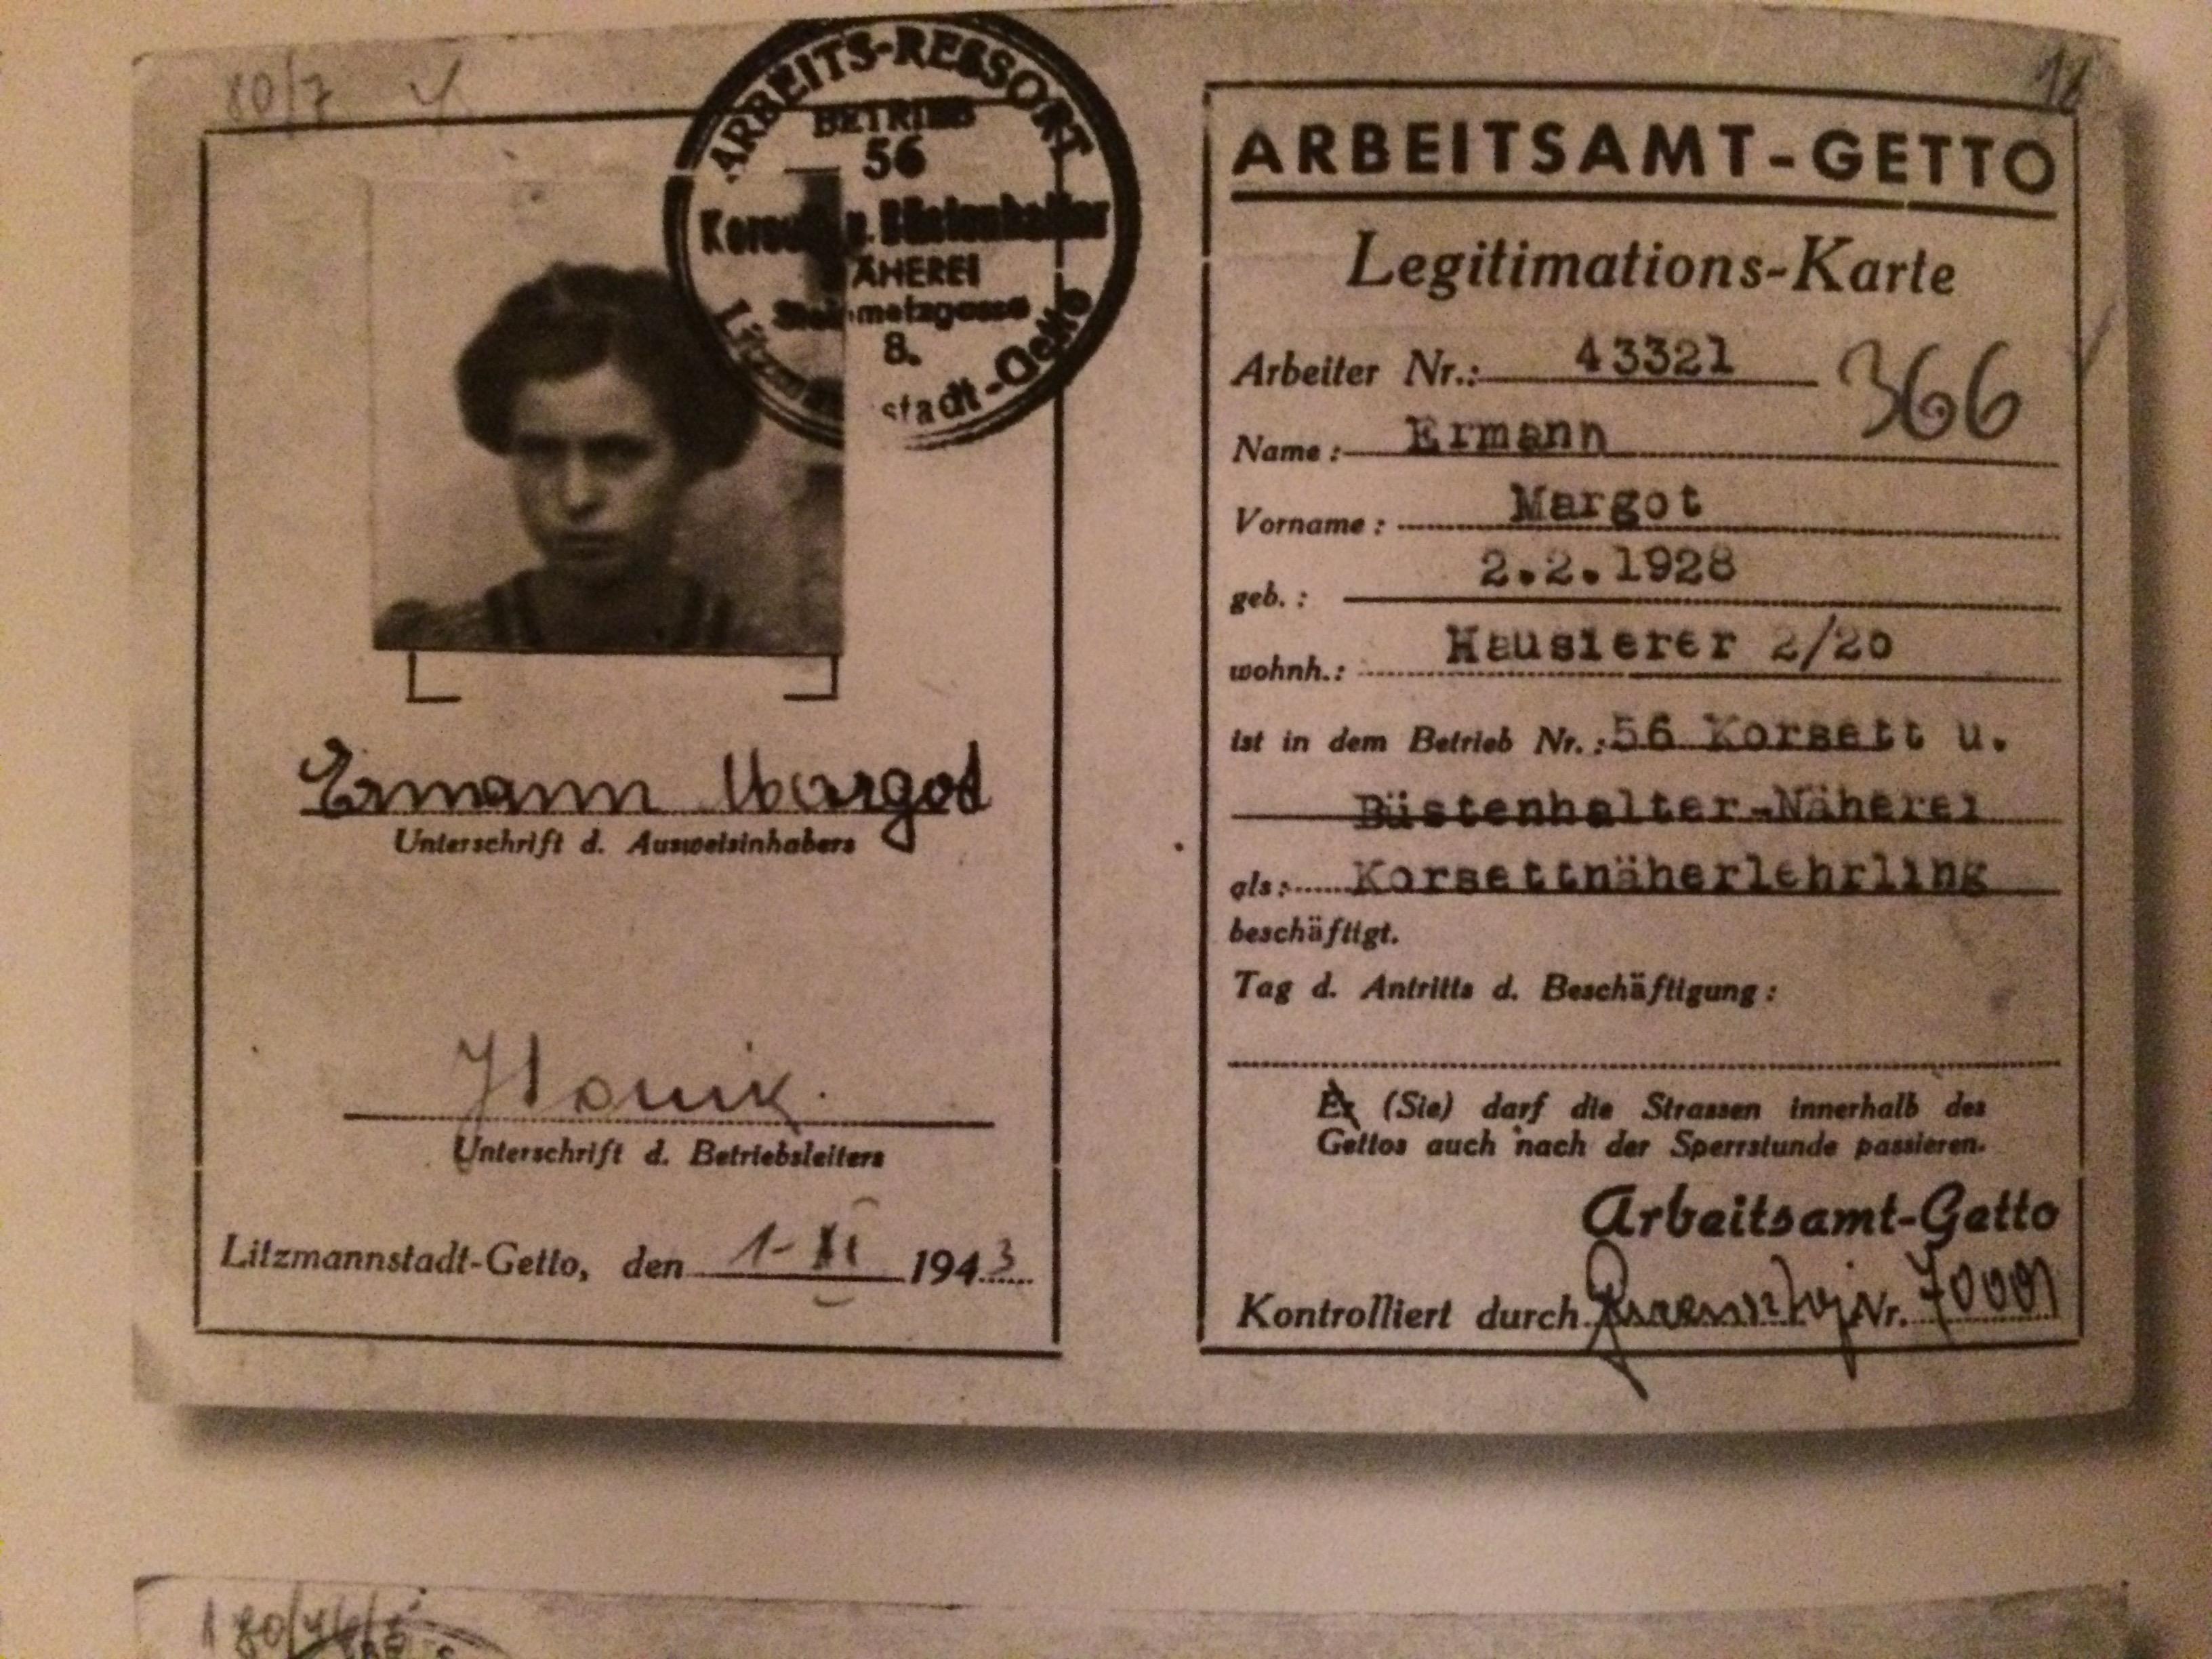 Margots arb ID